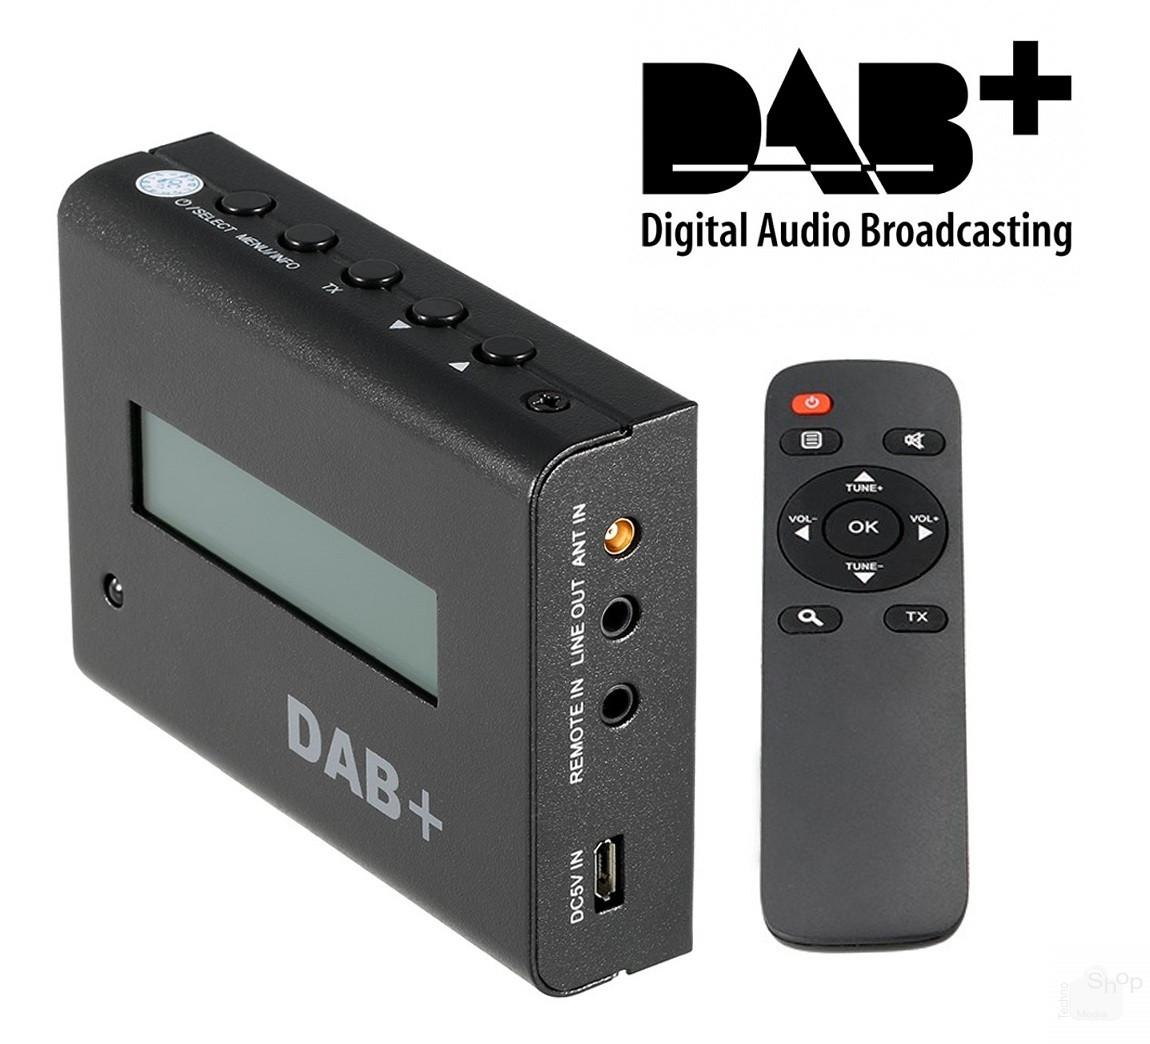 Kit Digitale Audio DAB DAB Radio Ricevitore con Antenna per autoradio Android